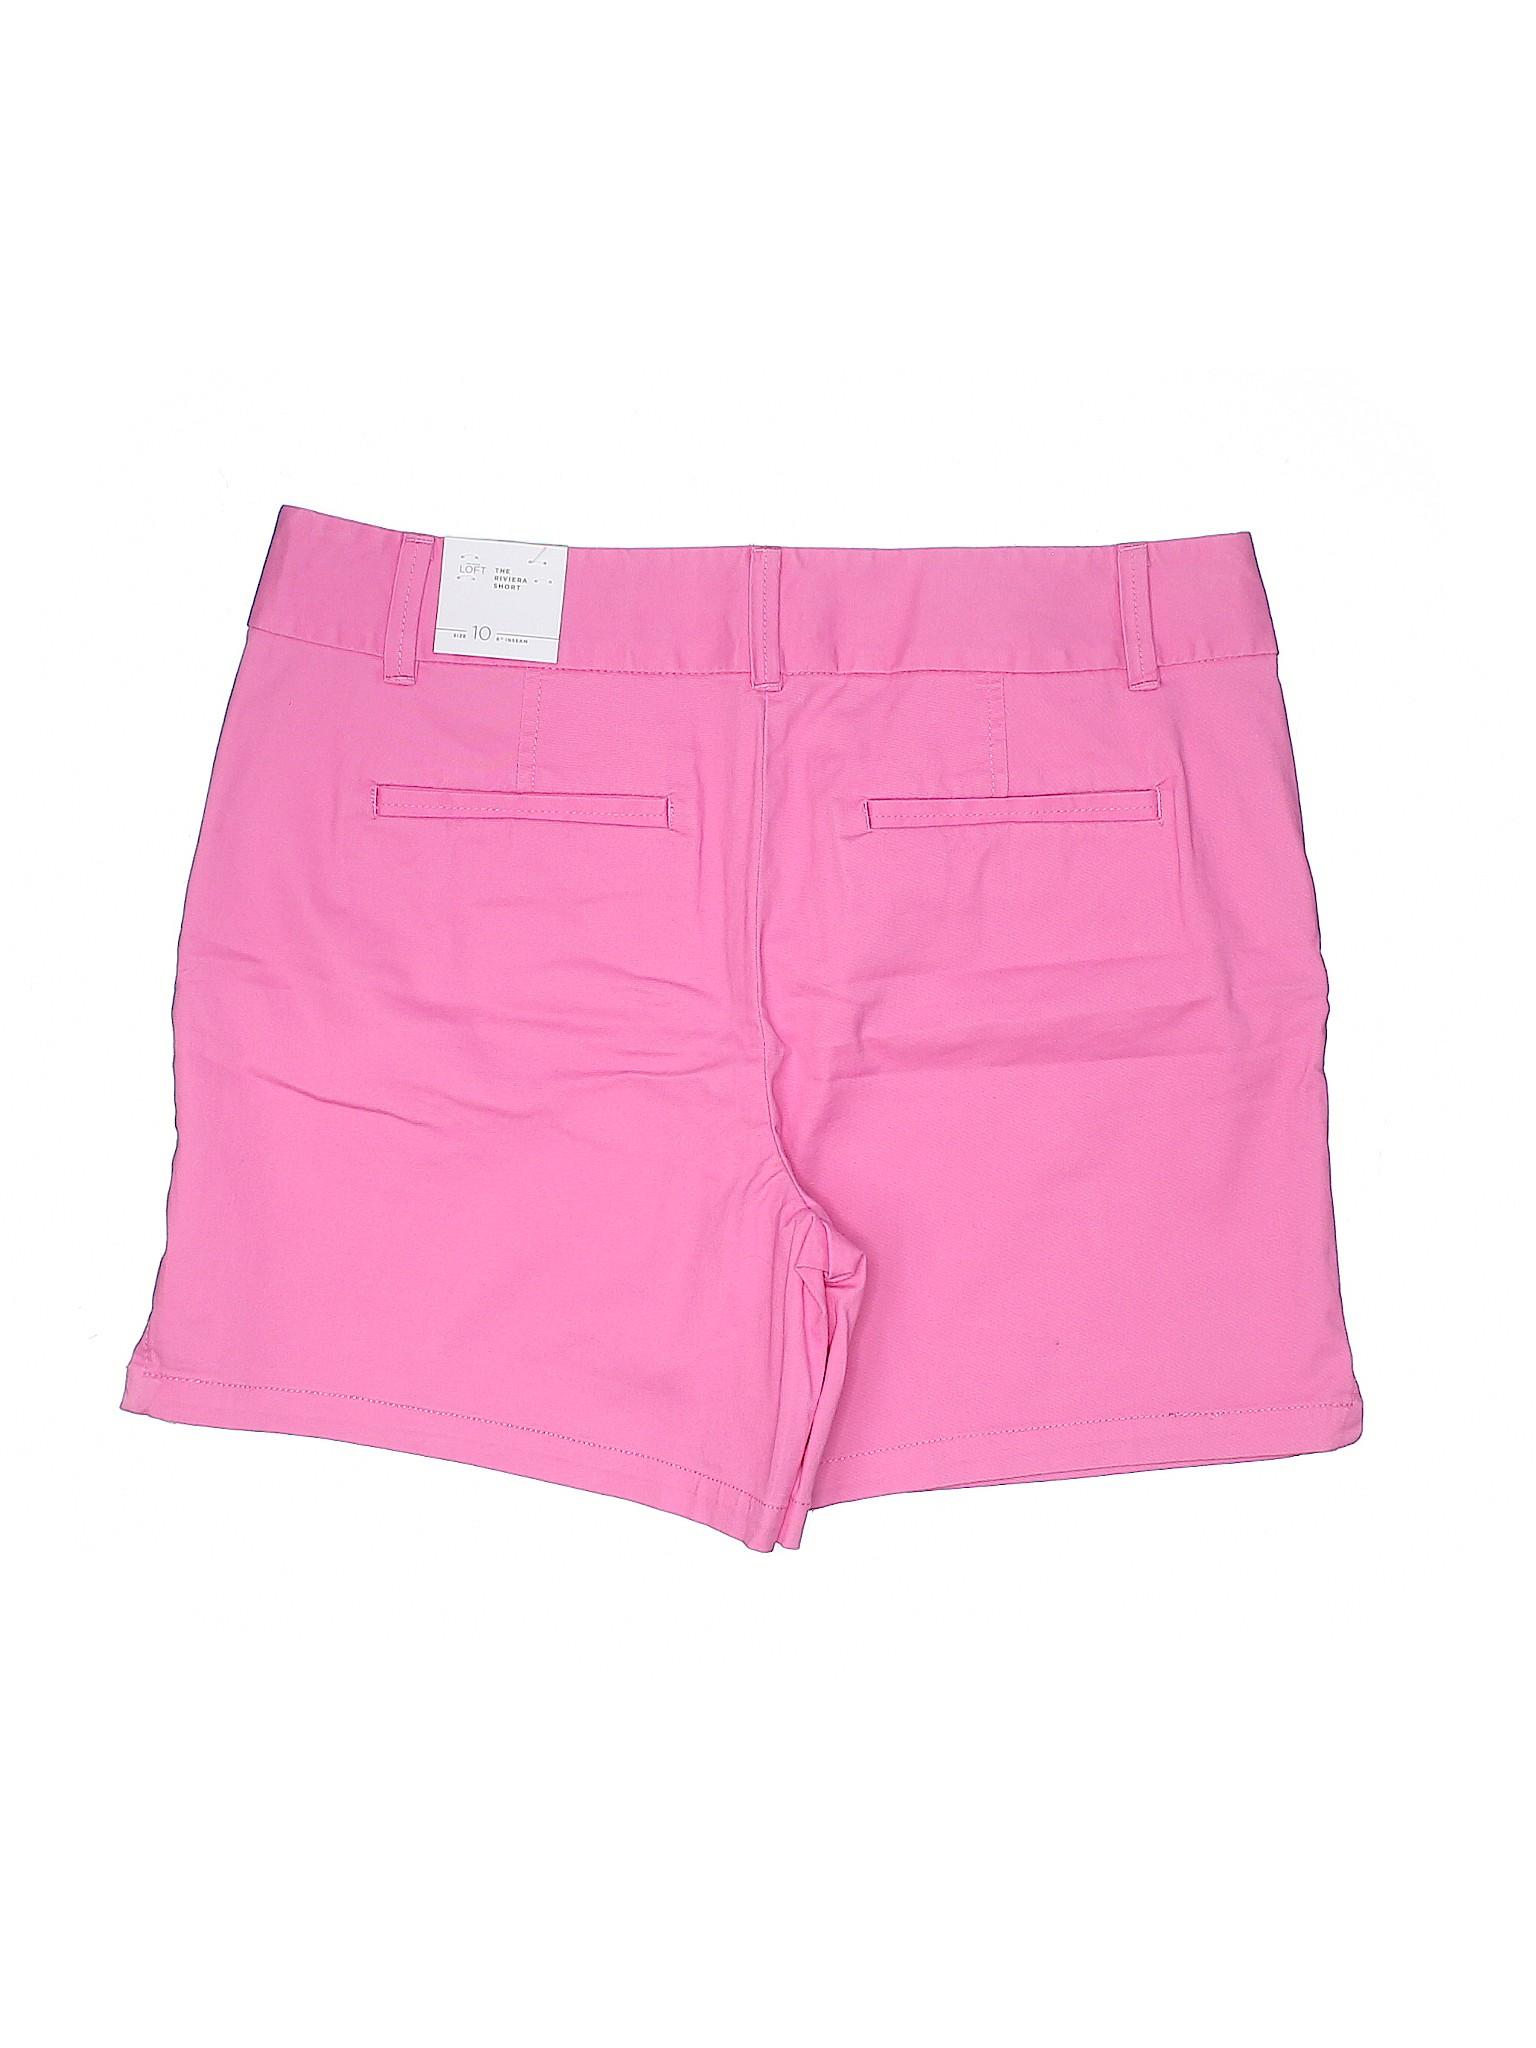 LOFT Shorts Khaki Boutique Taylor Ann S0nx7X1q